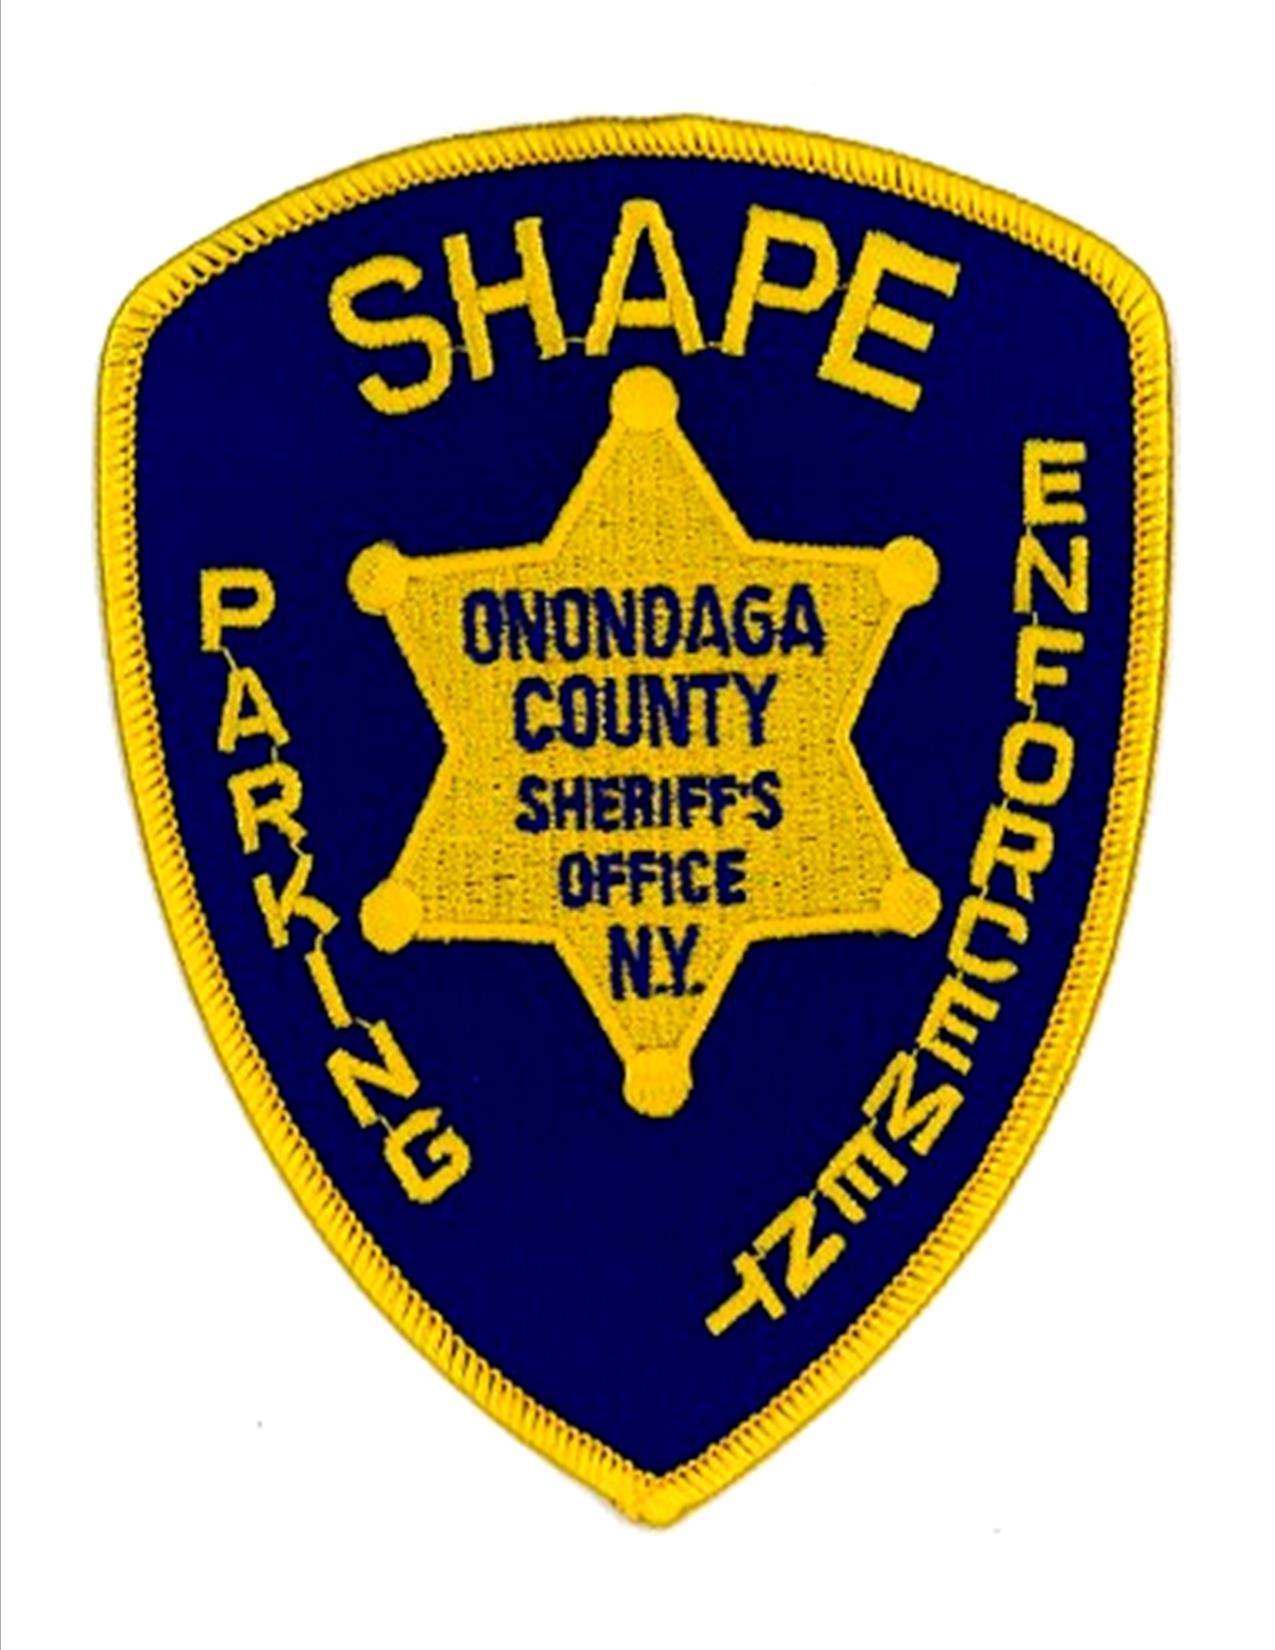 S H A P E  - Onondaga County Sheriff's Office